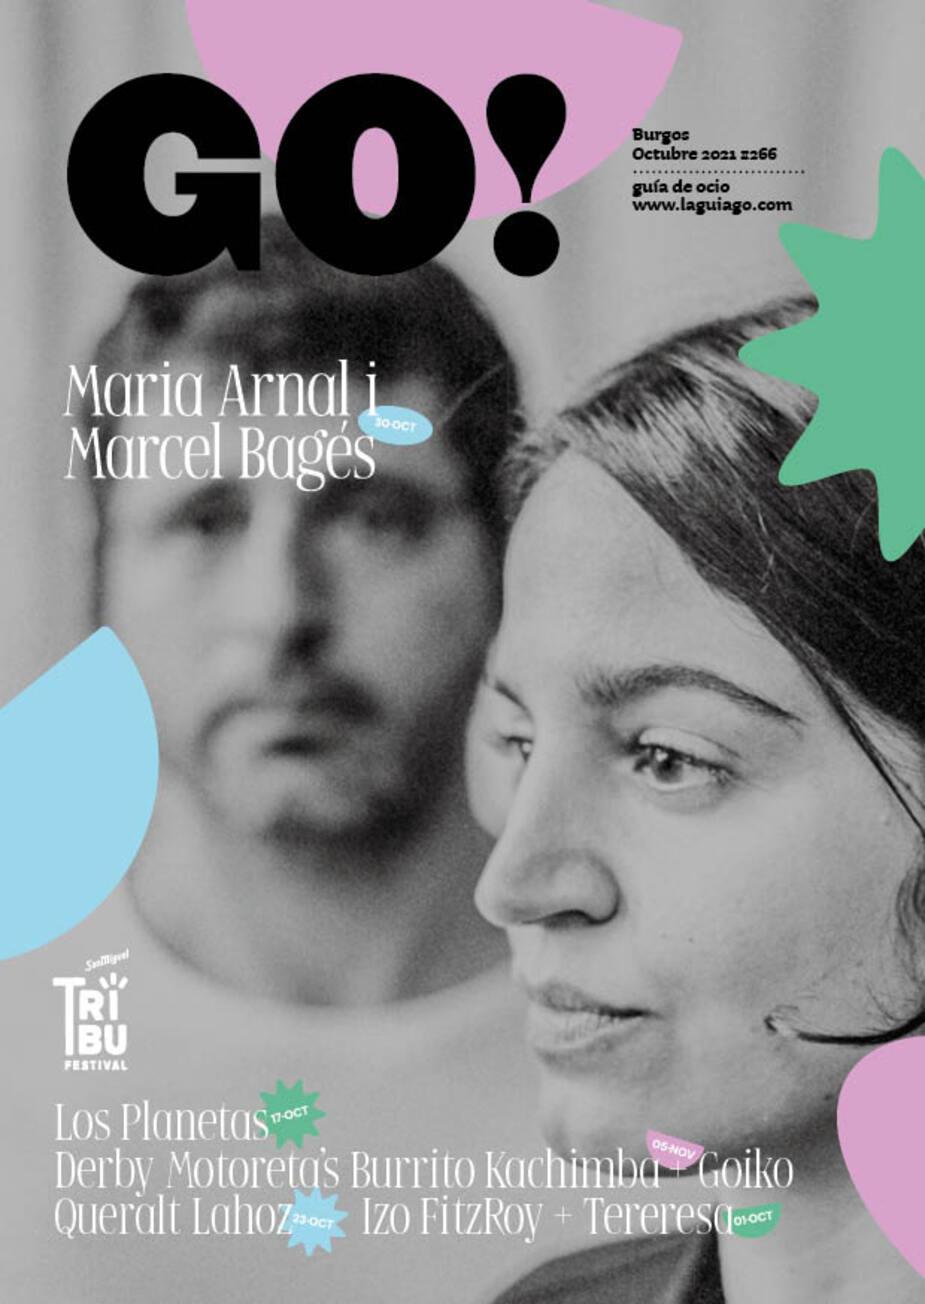 Portada Revista Burgos Octubre 21 1 1